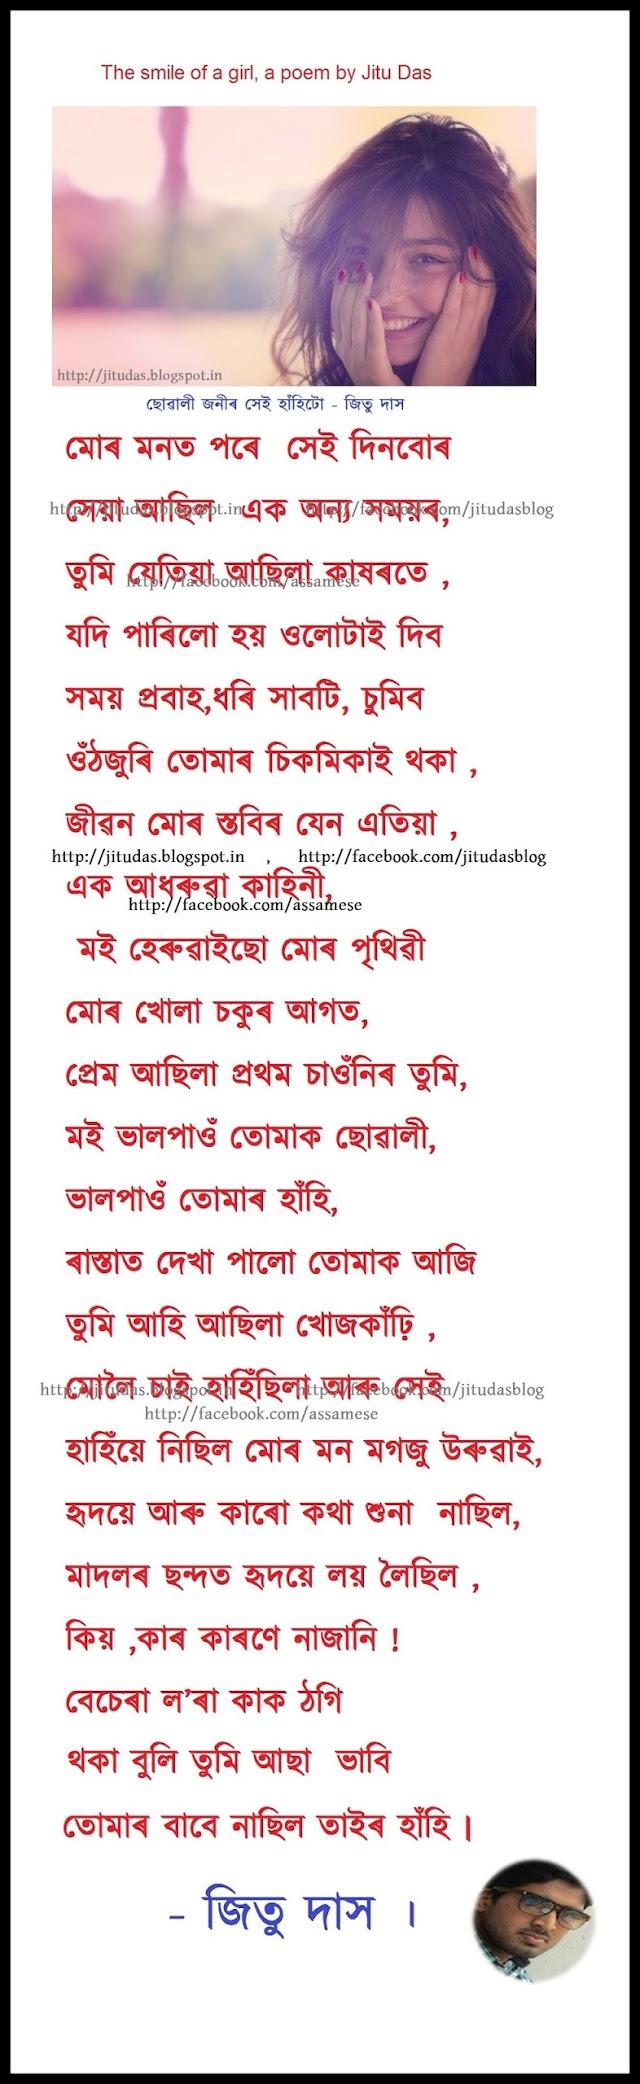 Assamese love and life poems by Jitu Das Poem Collection ( অসমীয়া কবিতা - জিতু দাস কবিতা সংগ্ৰ্হ )